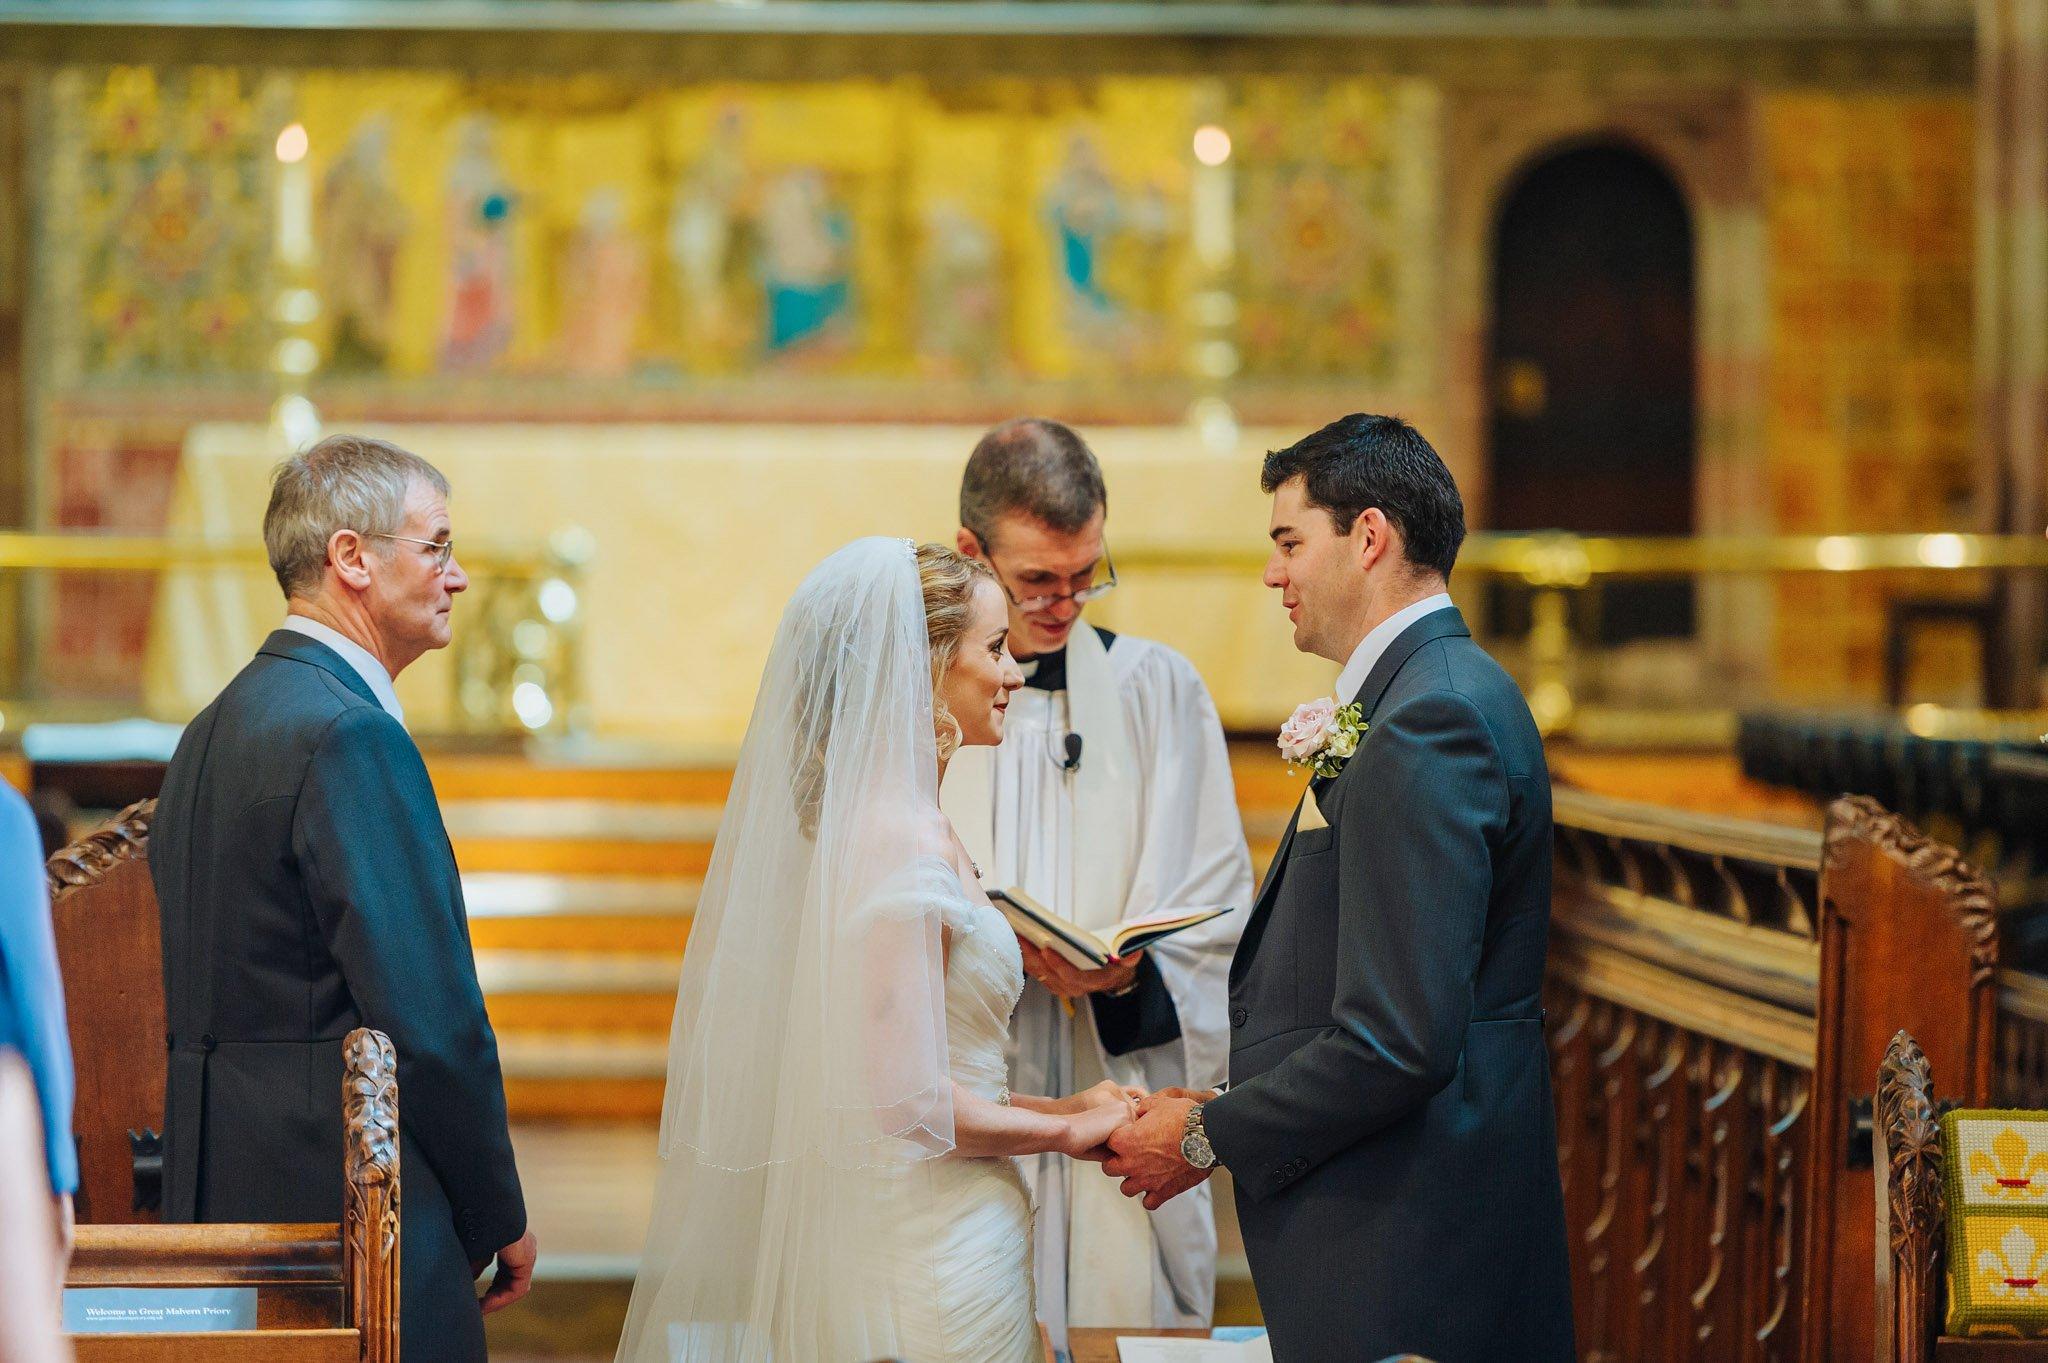 Georgina + Mike - Wedding photography in Malvern, Worcestershire 27